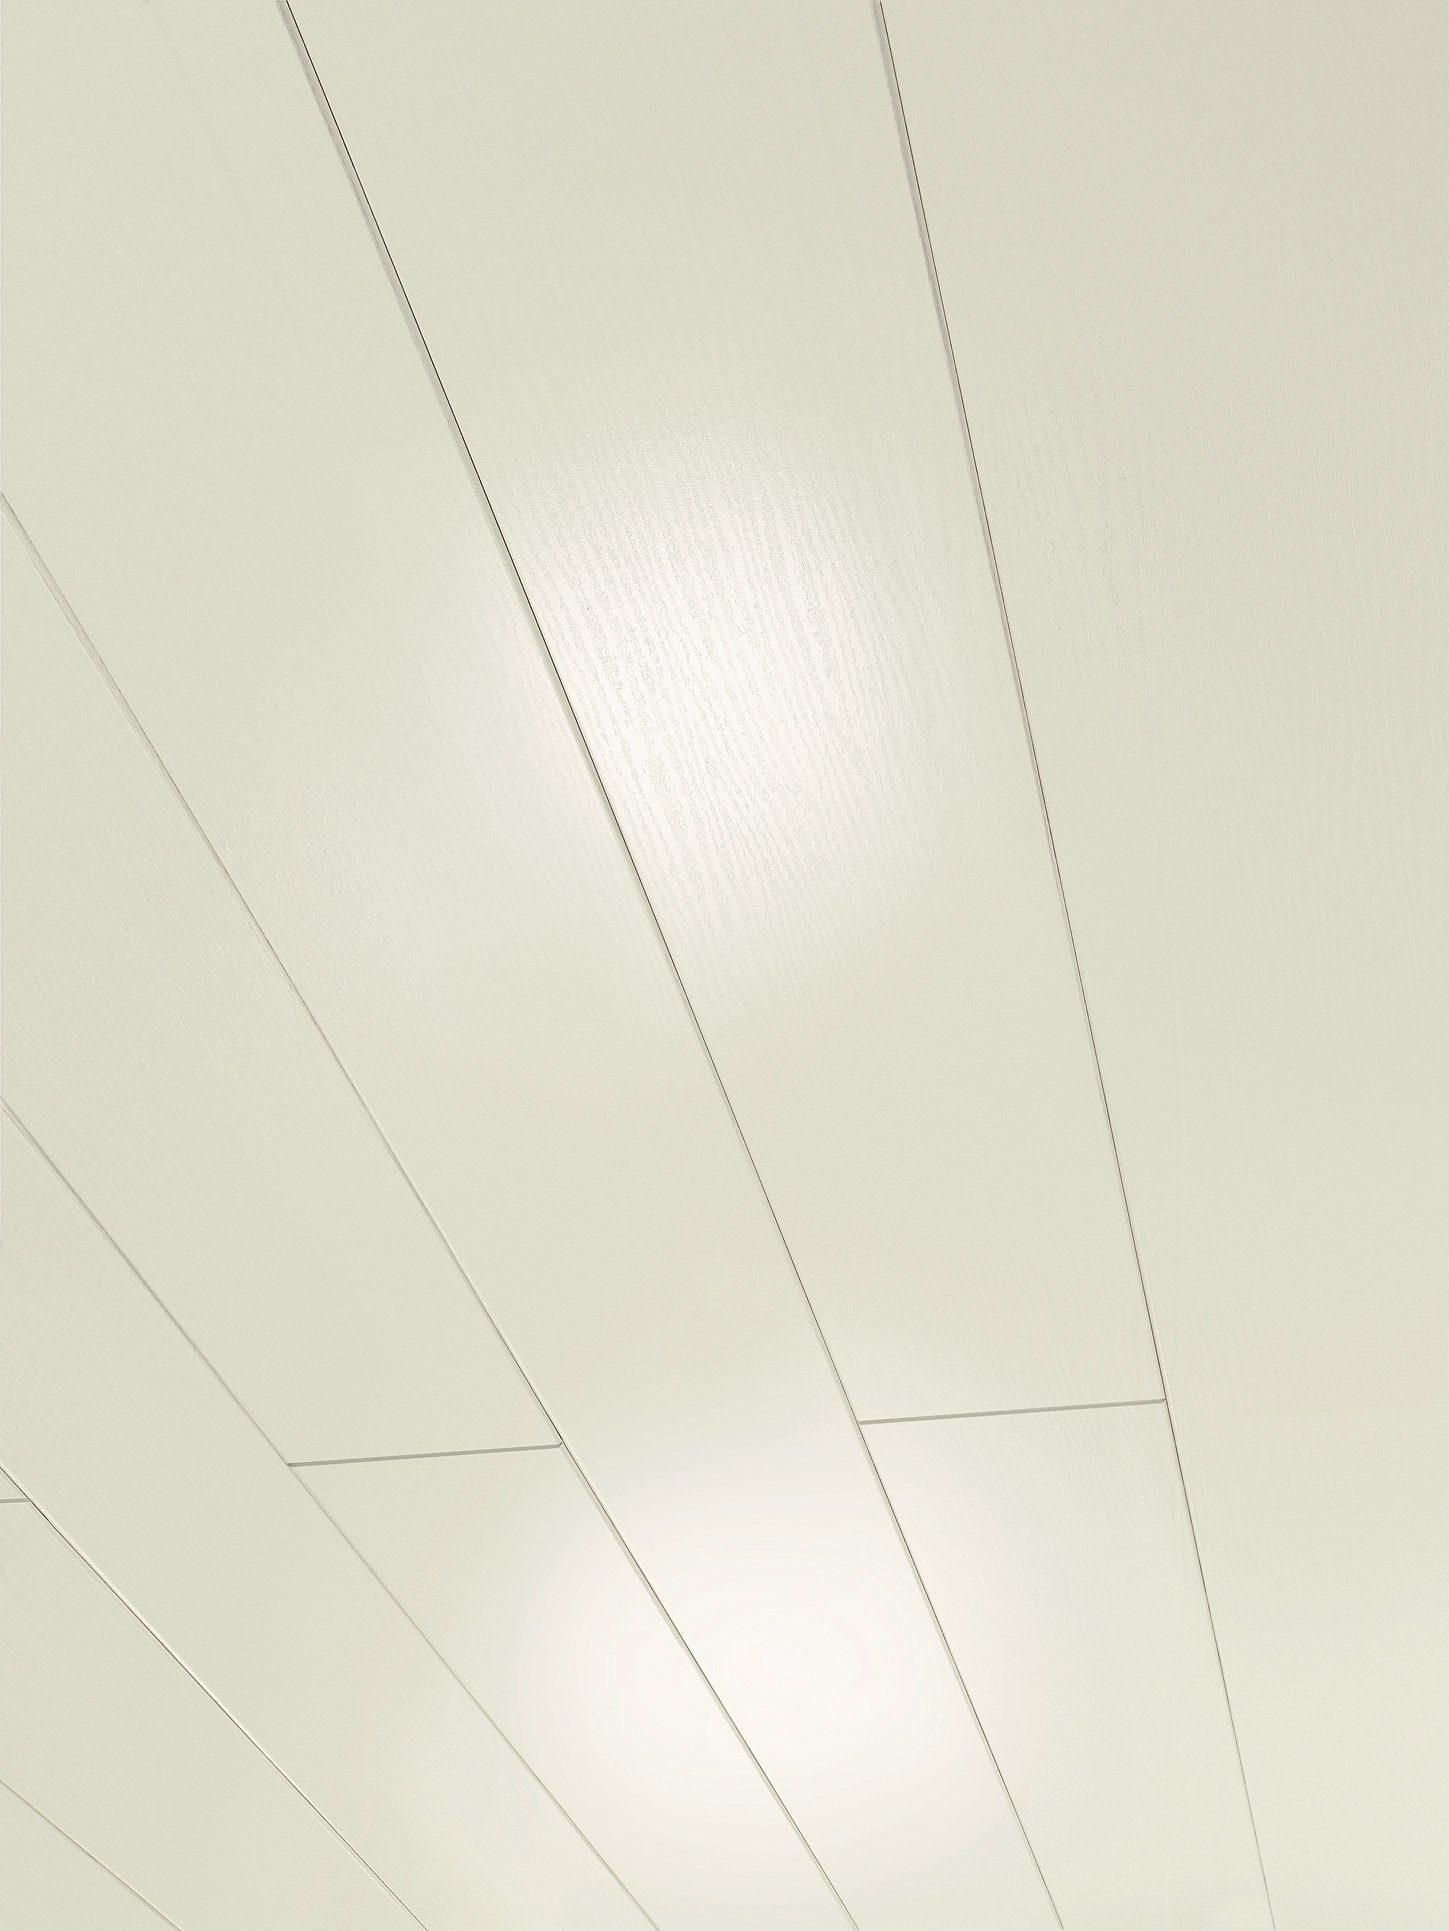 PARADOR Verkleidungspaneel »Novara«, Esche weiß glänzend, 6 Paneele, 1,5 m²